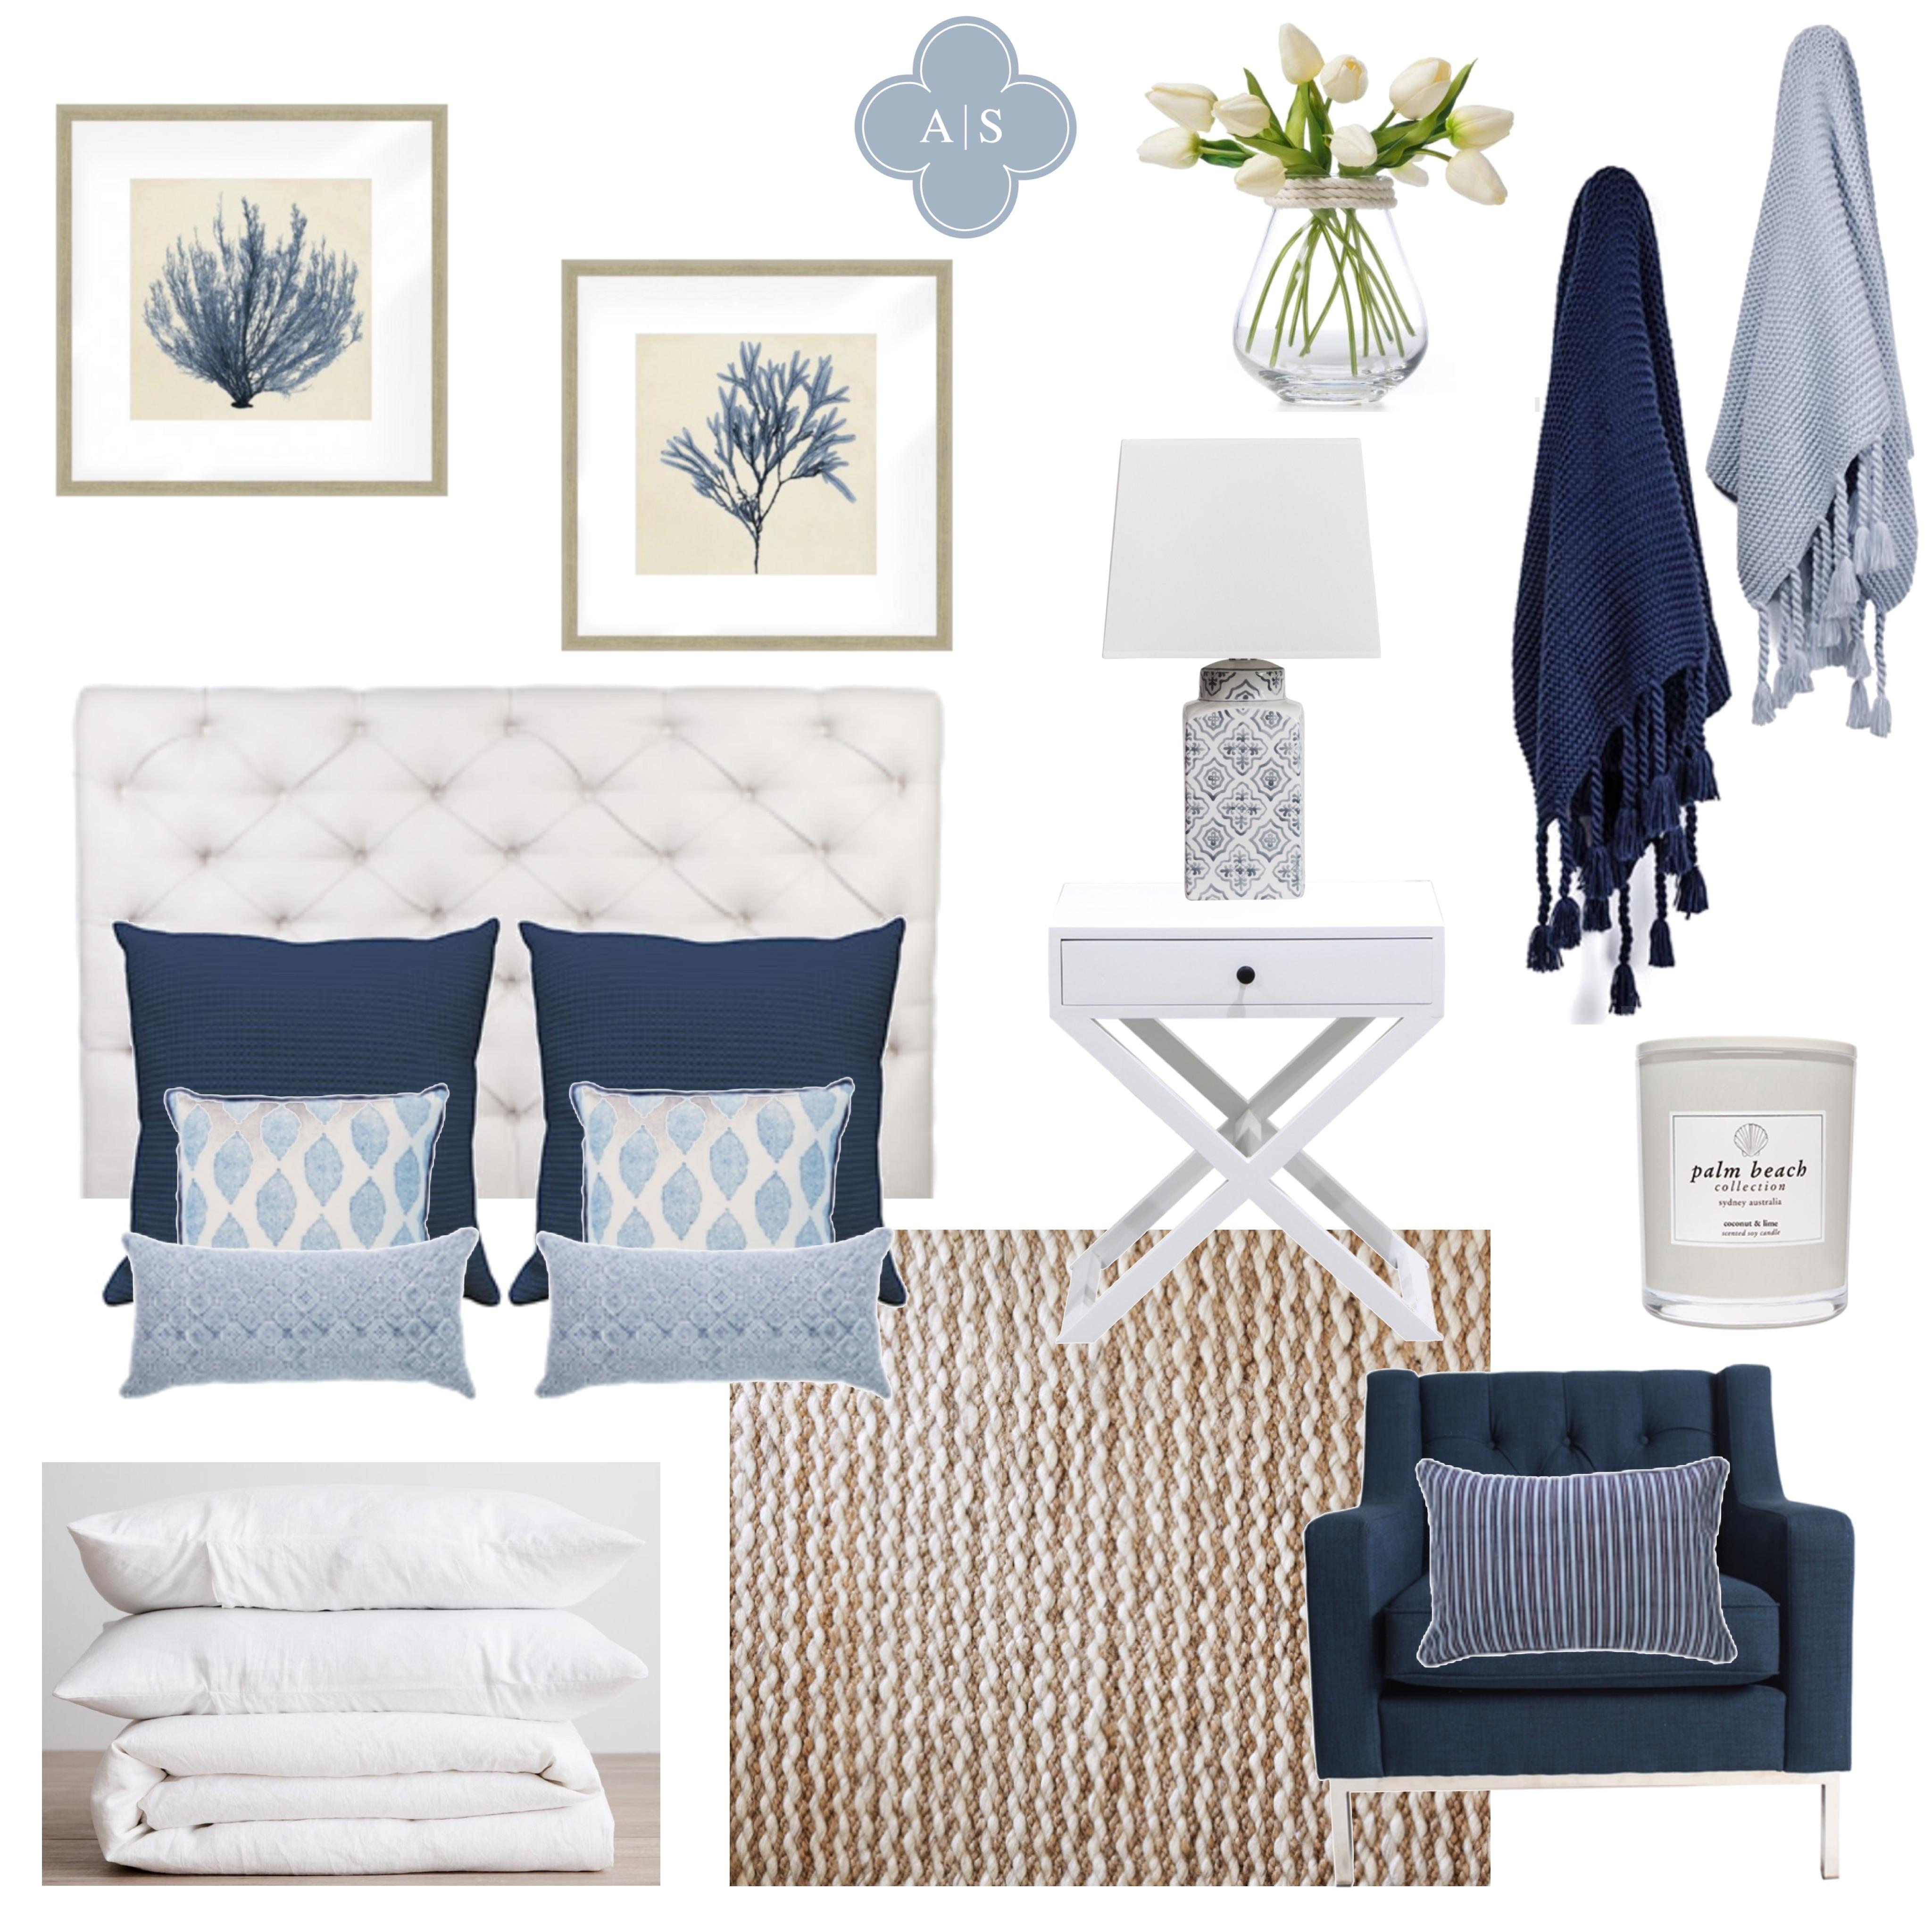 Amanda Smythe Interior Stylist, Interior Styling, Interior Decorating, Furniture